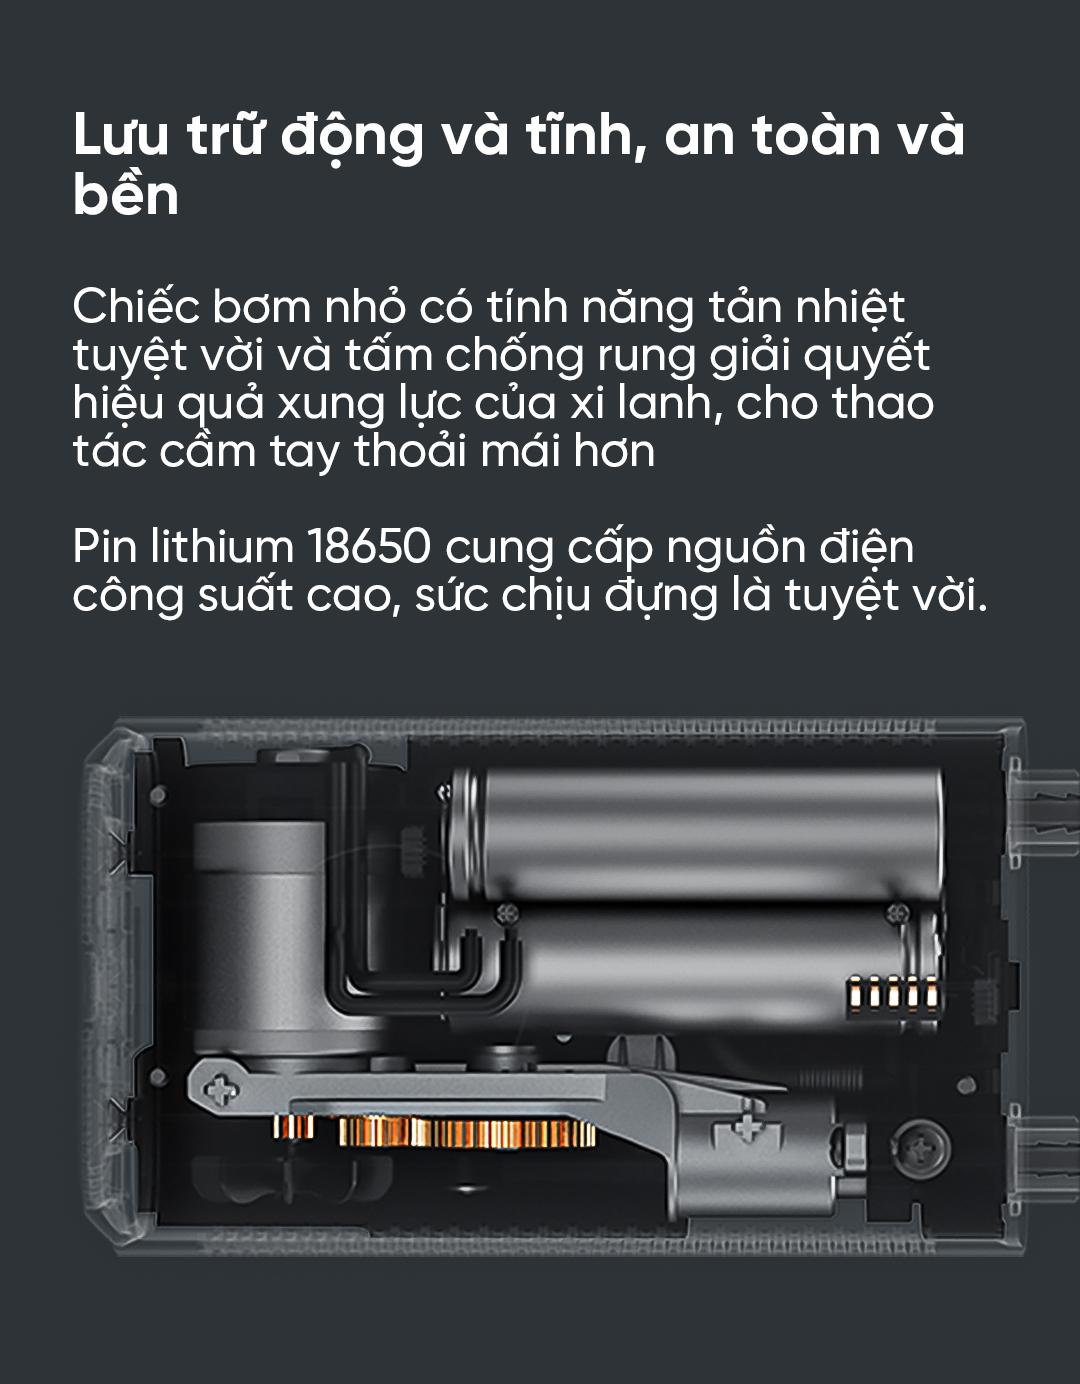 Máy bơm lốp cầm tay tự động Xiaomi Mijia MJCQ01QJ (7)